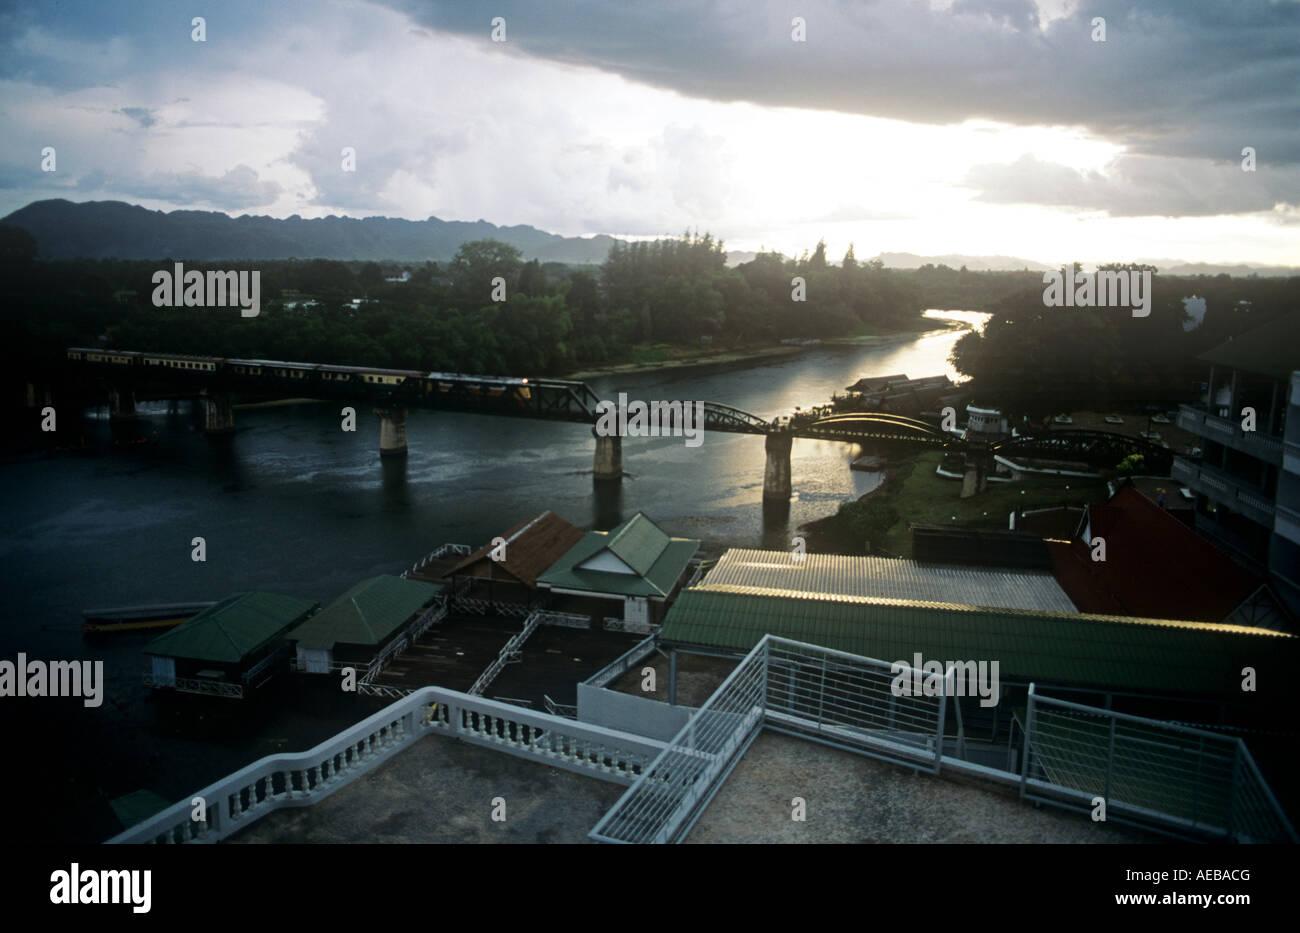 The Bridge over The River Quai, Kanchanaburi, Thailand, SE Asia - Stock Image